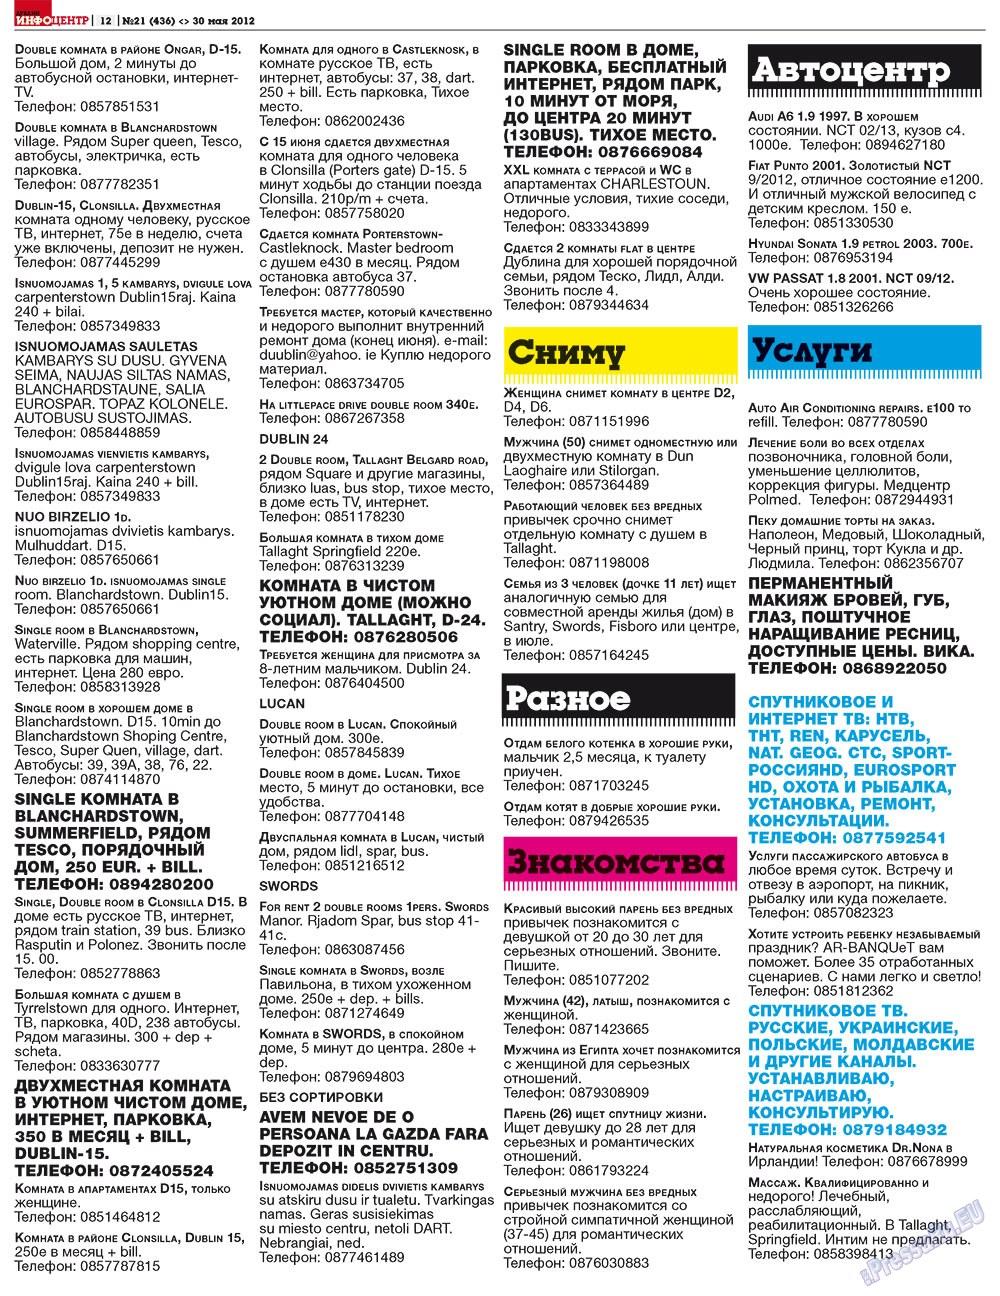 Дублин инфоцентр (газета). 2012 год, номер 21, стр. 12